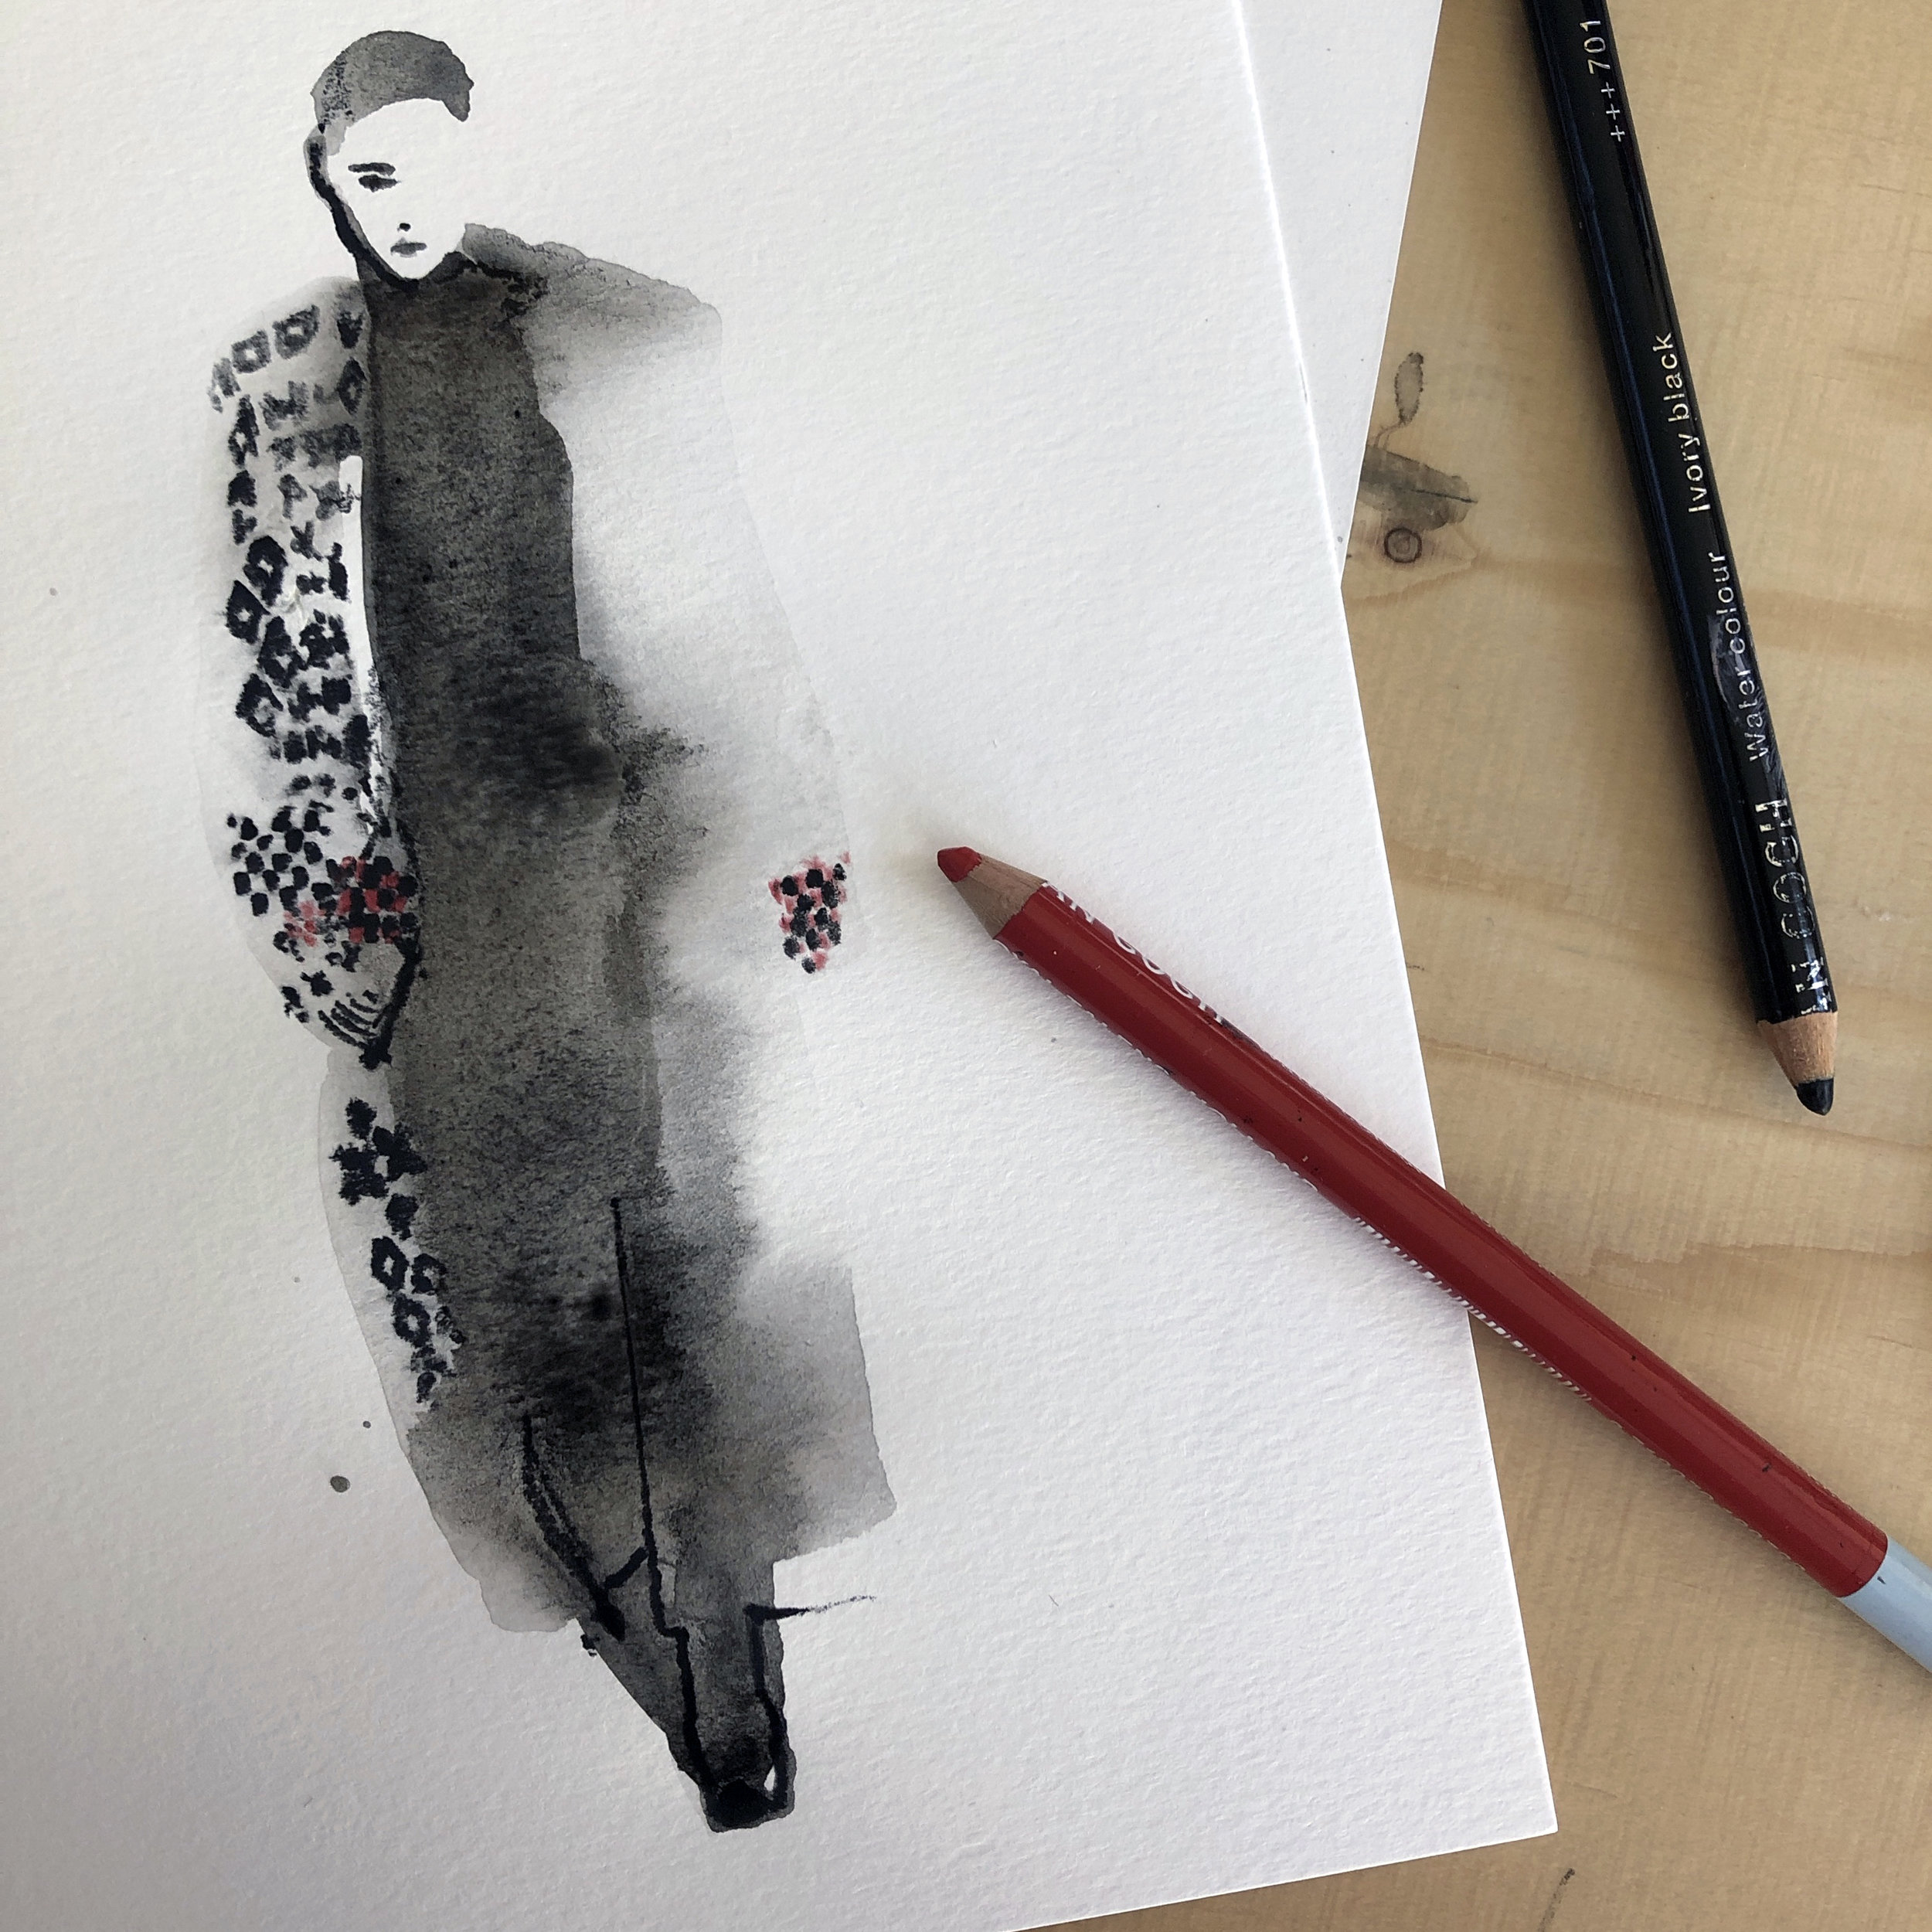 TessaIllustration_Runway_HaiderAckermann_2019.jpg